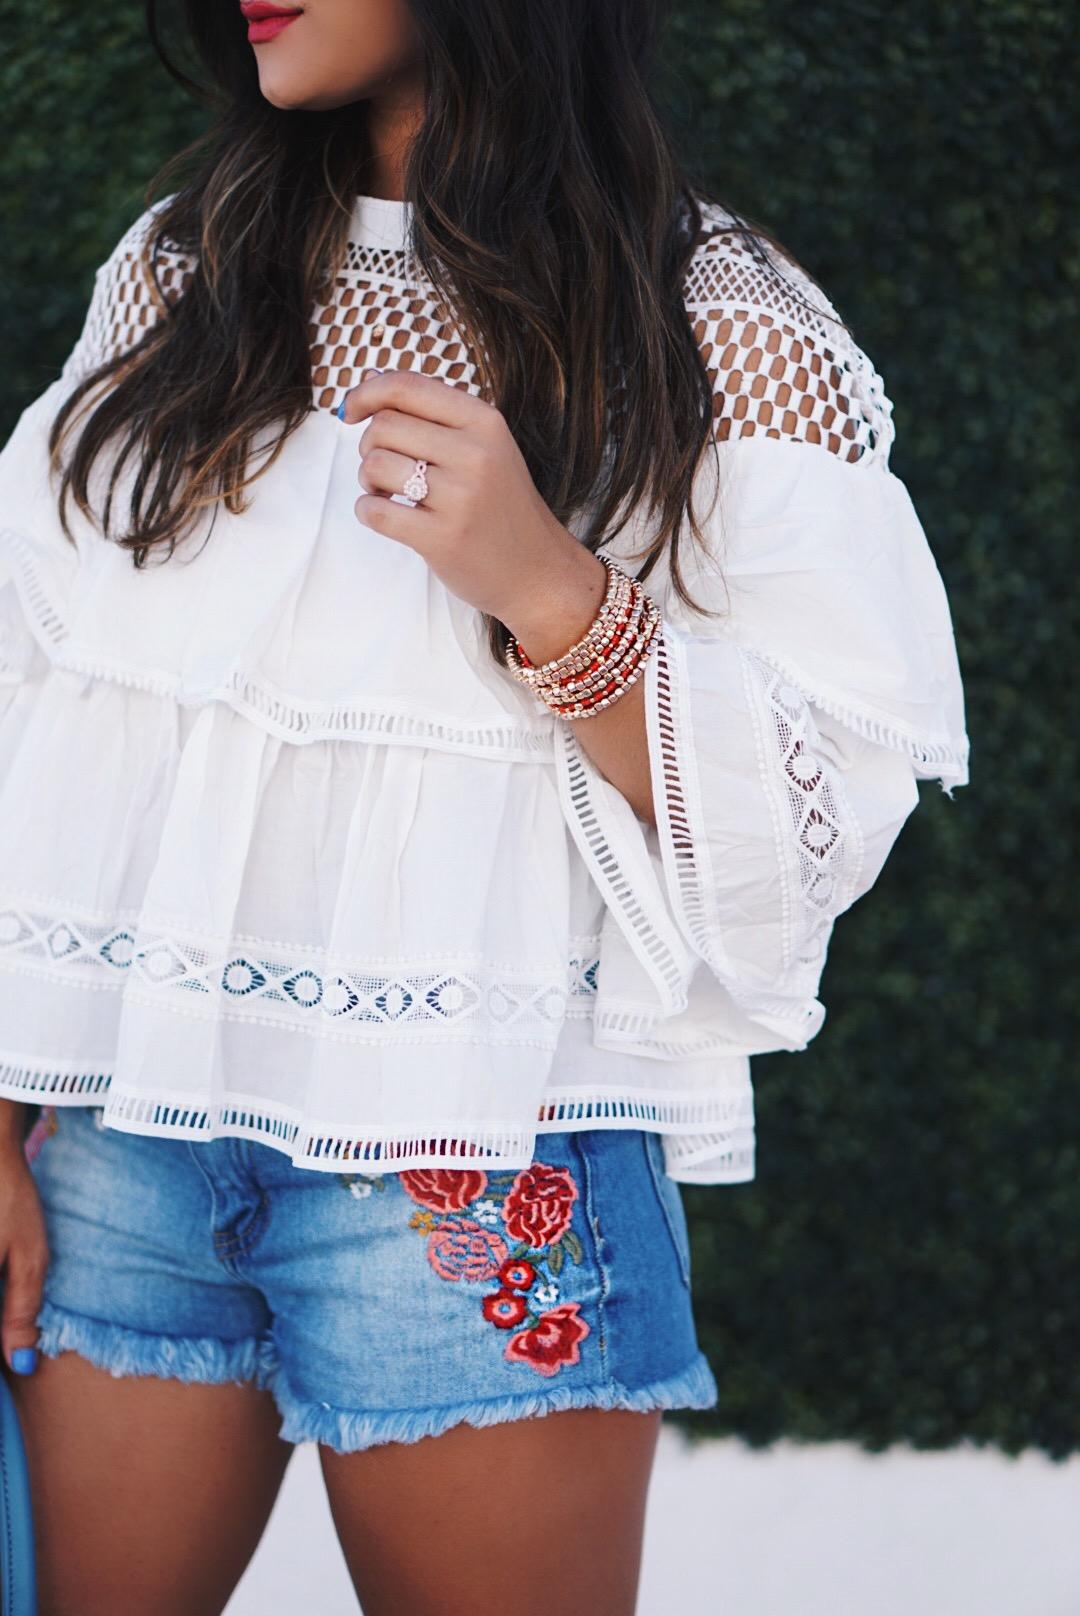 Sugar Love Chic blogger Krista Perez wearing white ruffle top and cutoff shorts